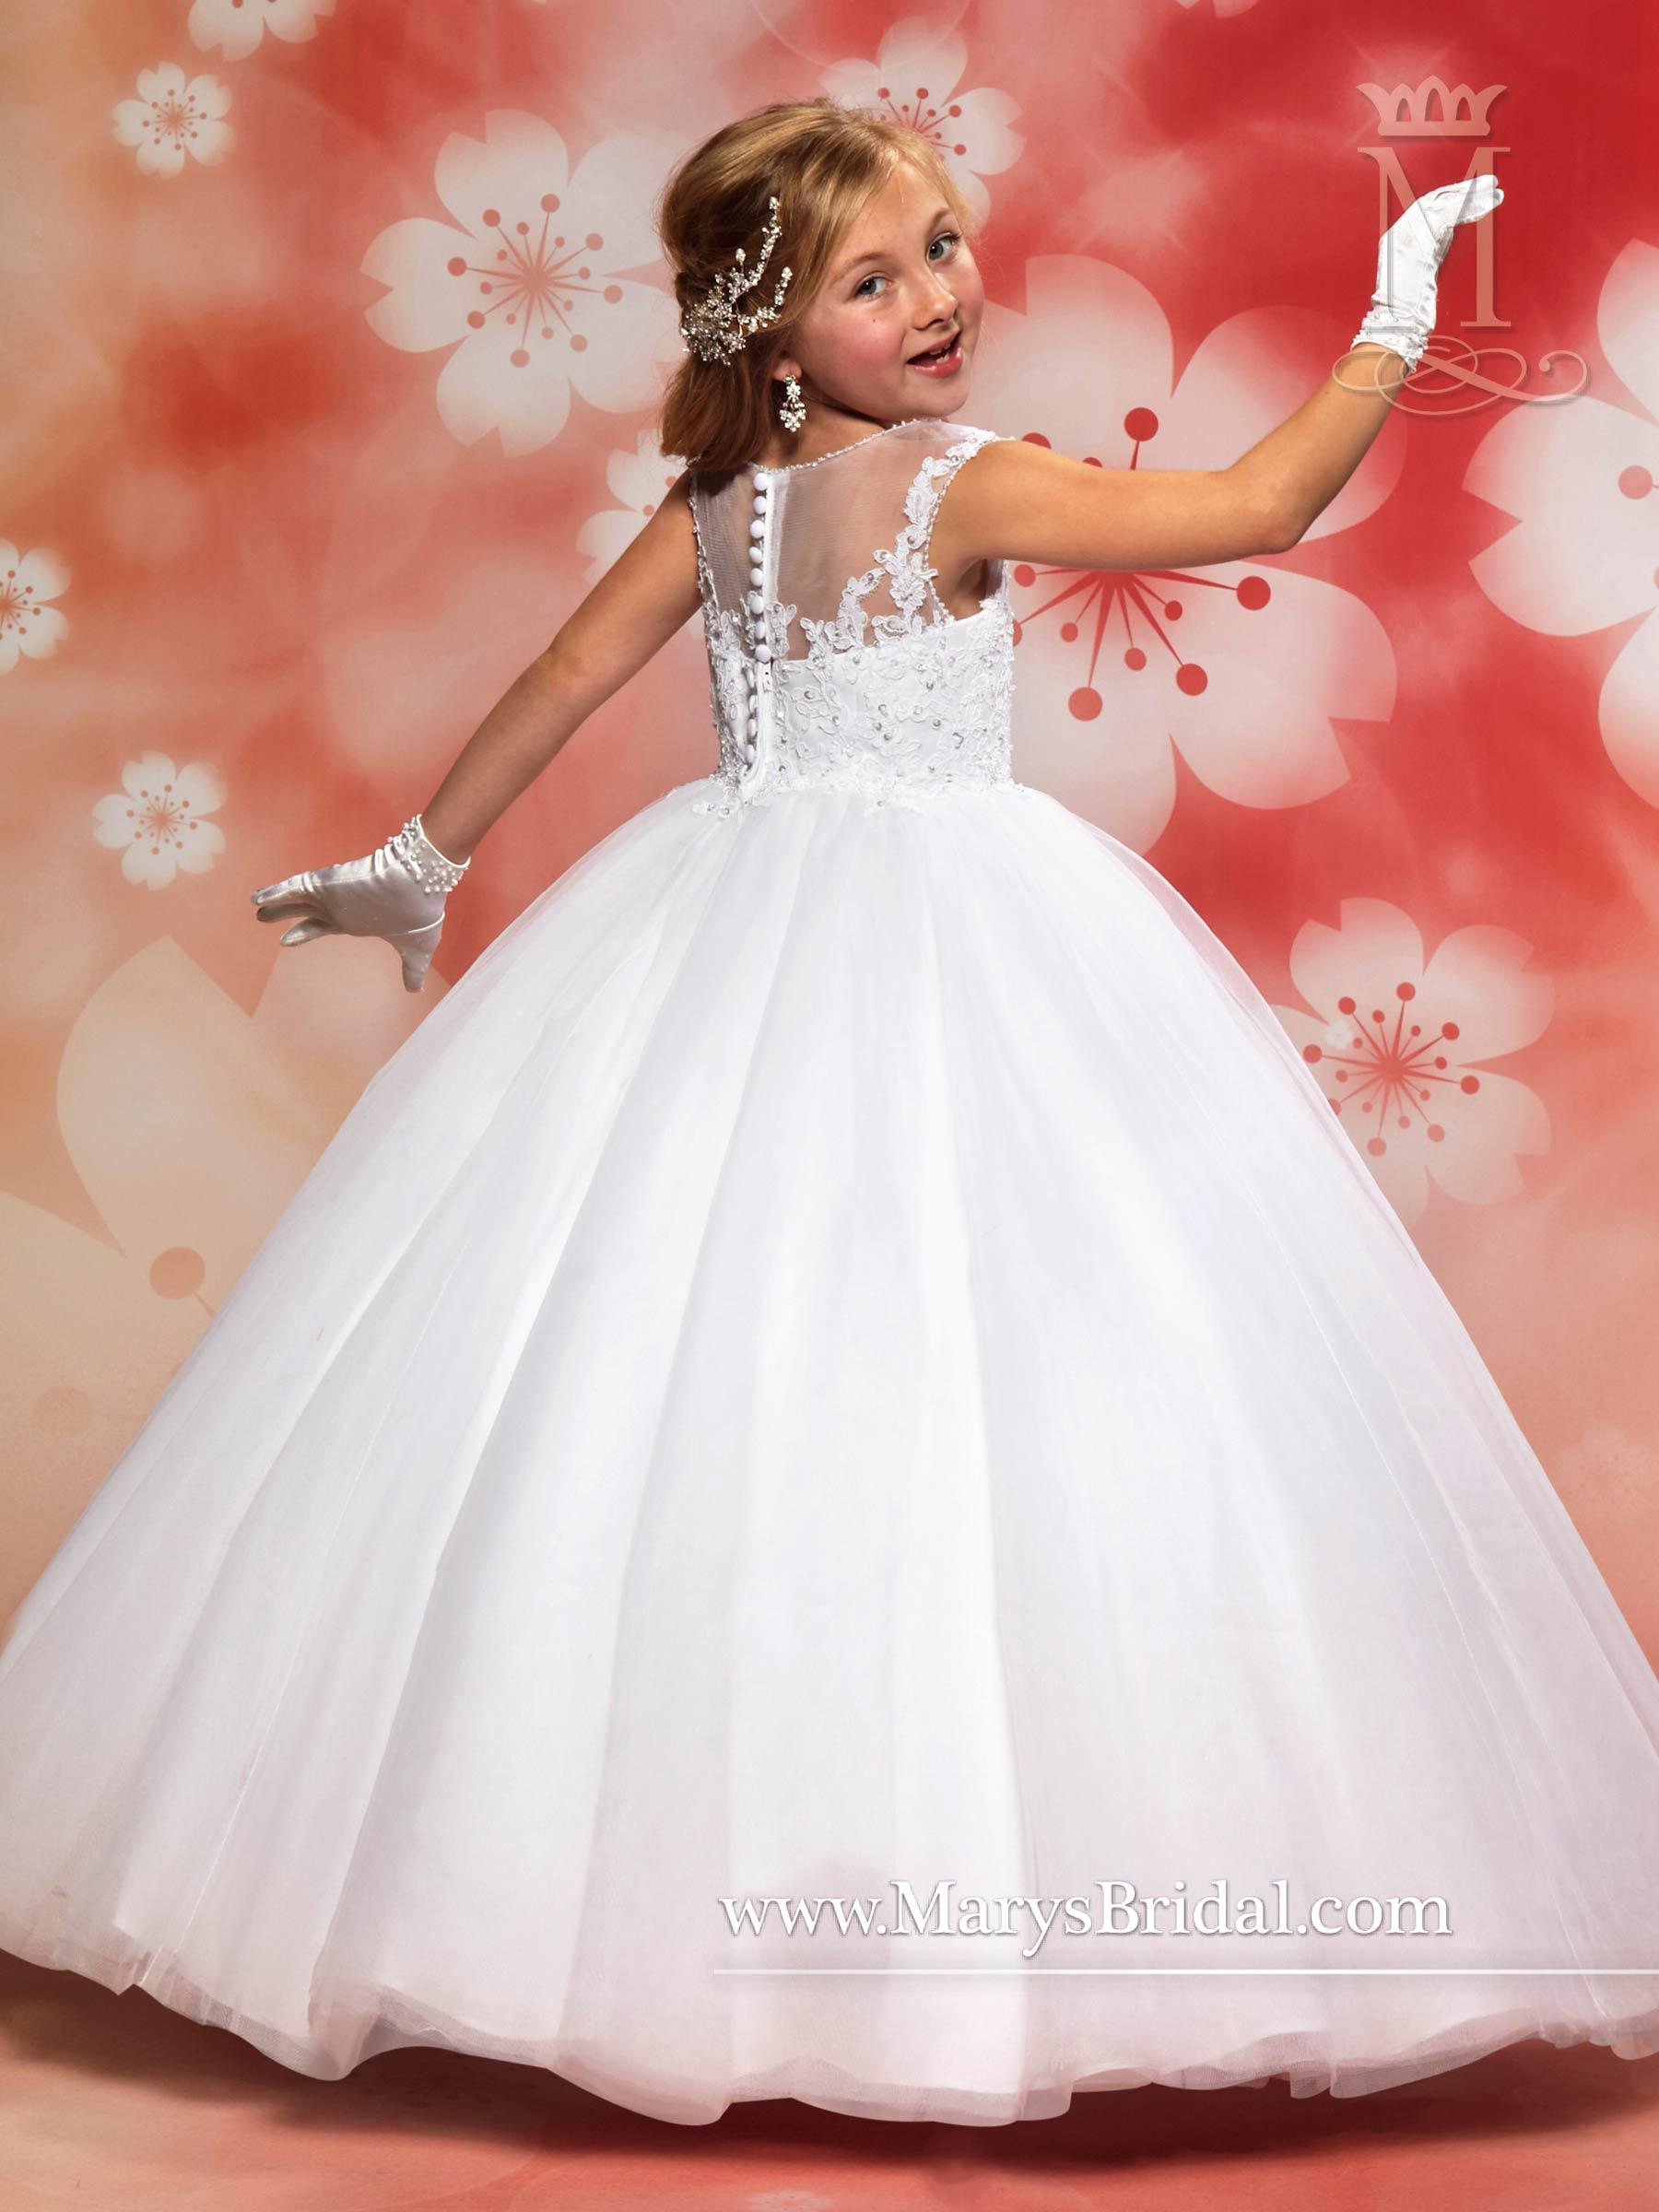 angel flower girl dresses style f405 in ivory or white. Black Bedroom Furniture Sets. Home Design Ideas